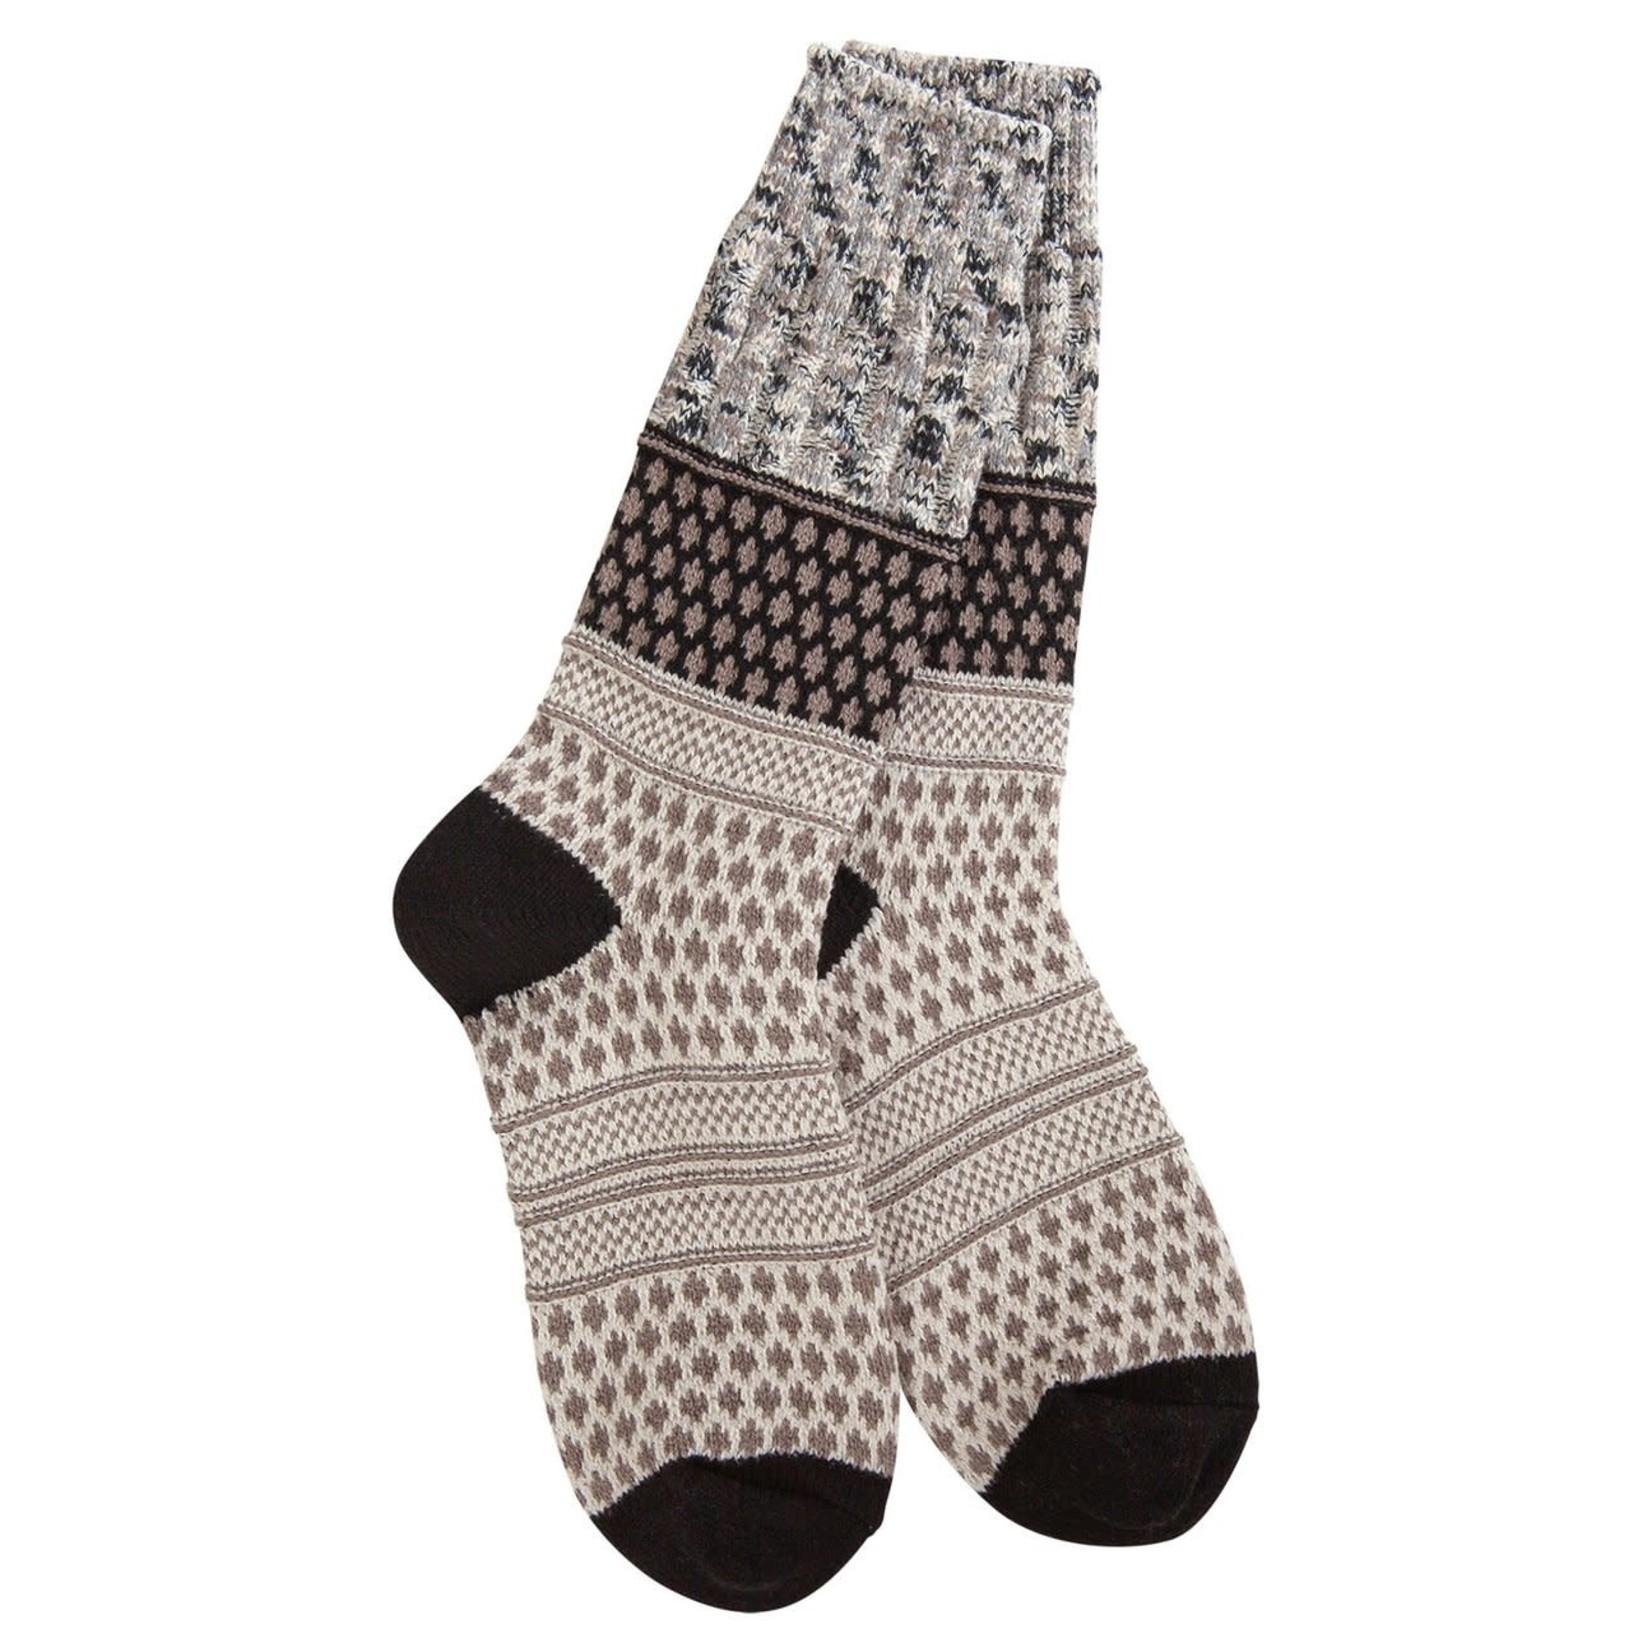 World's Softest Weekend Gallery Textured Crew Socks- Oatmeal Confetti